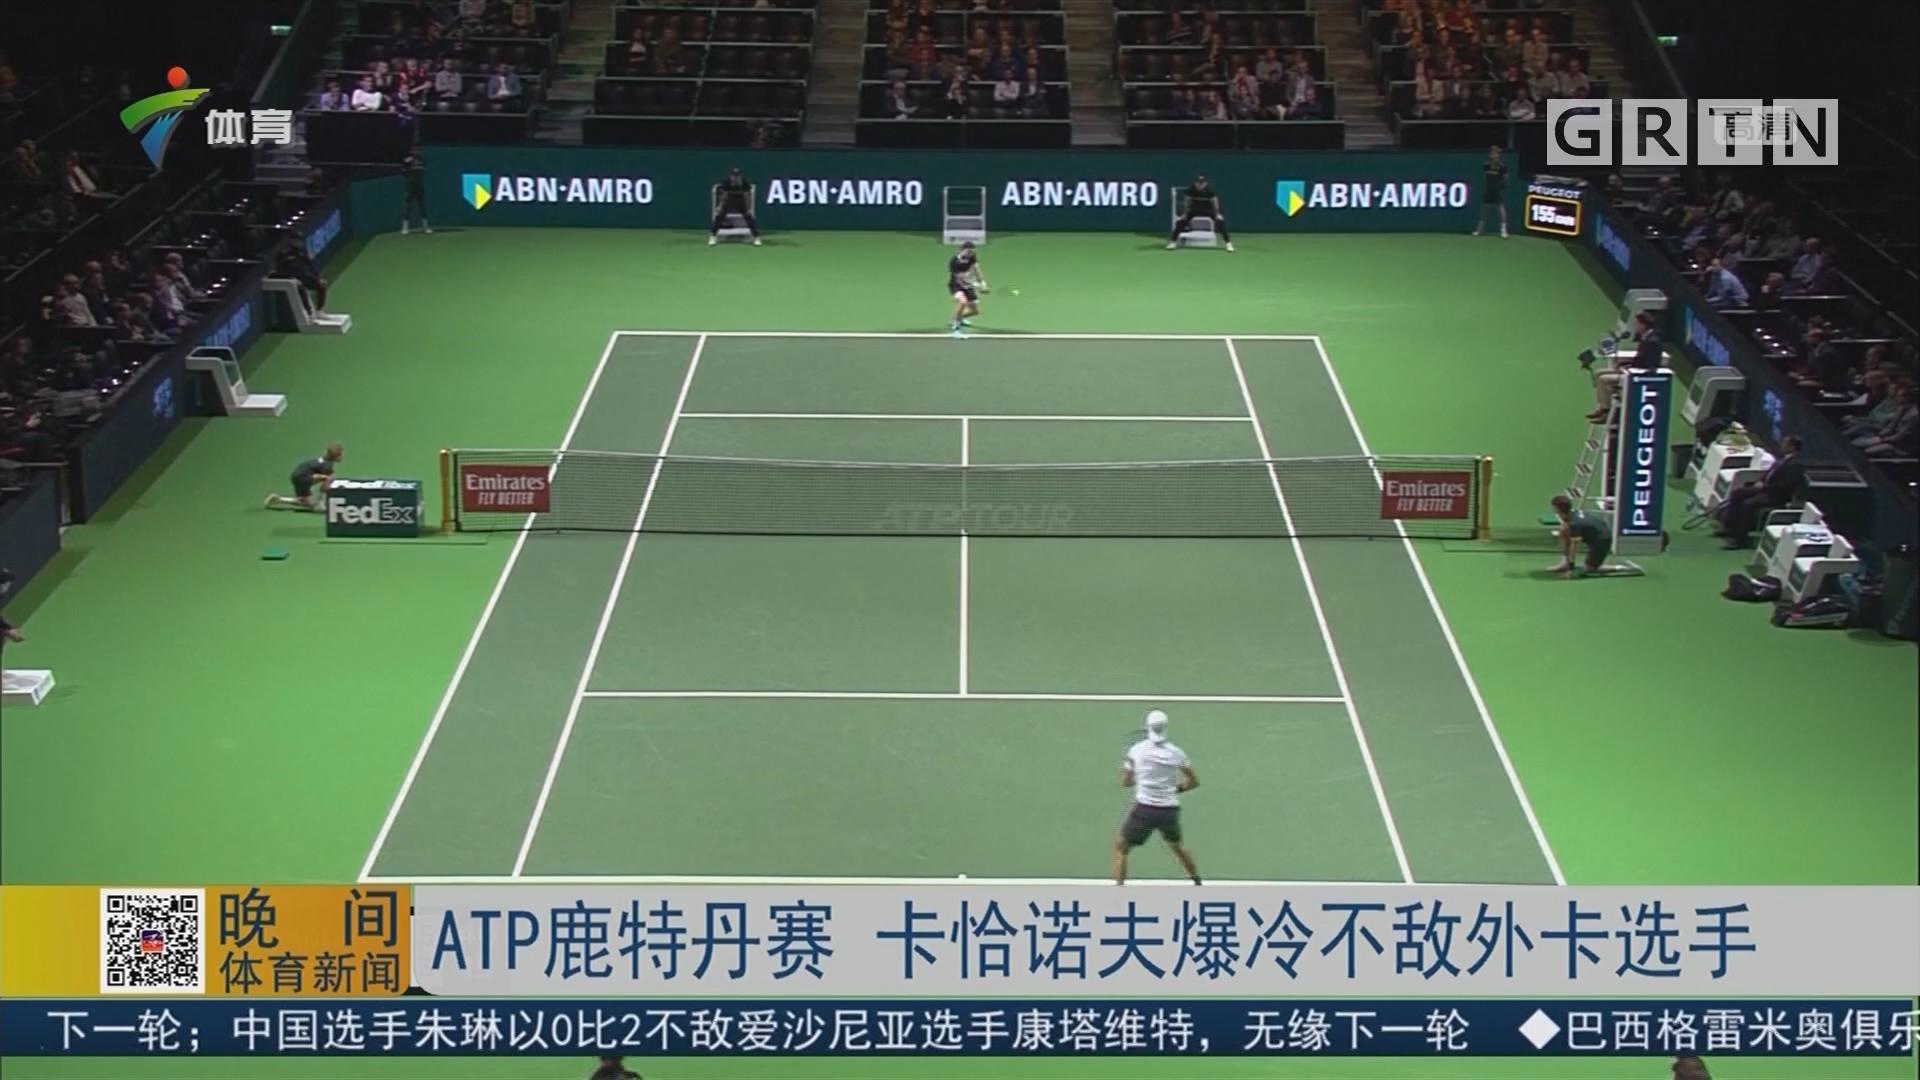 ATP鹿特丹赛 锦织圭逆转晋级次轮